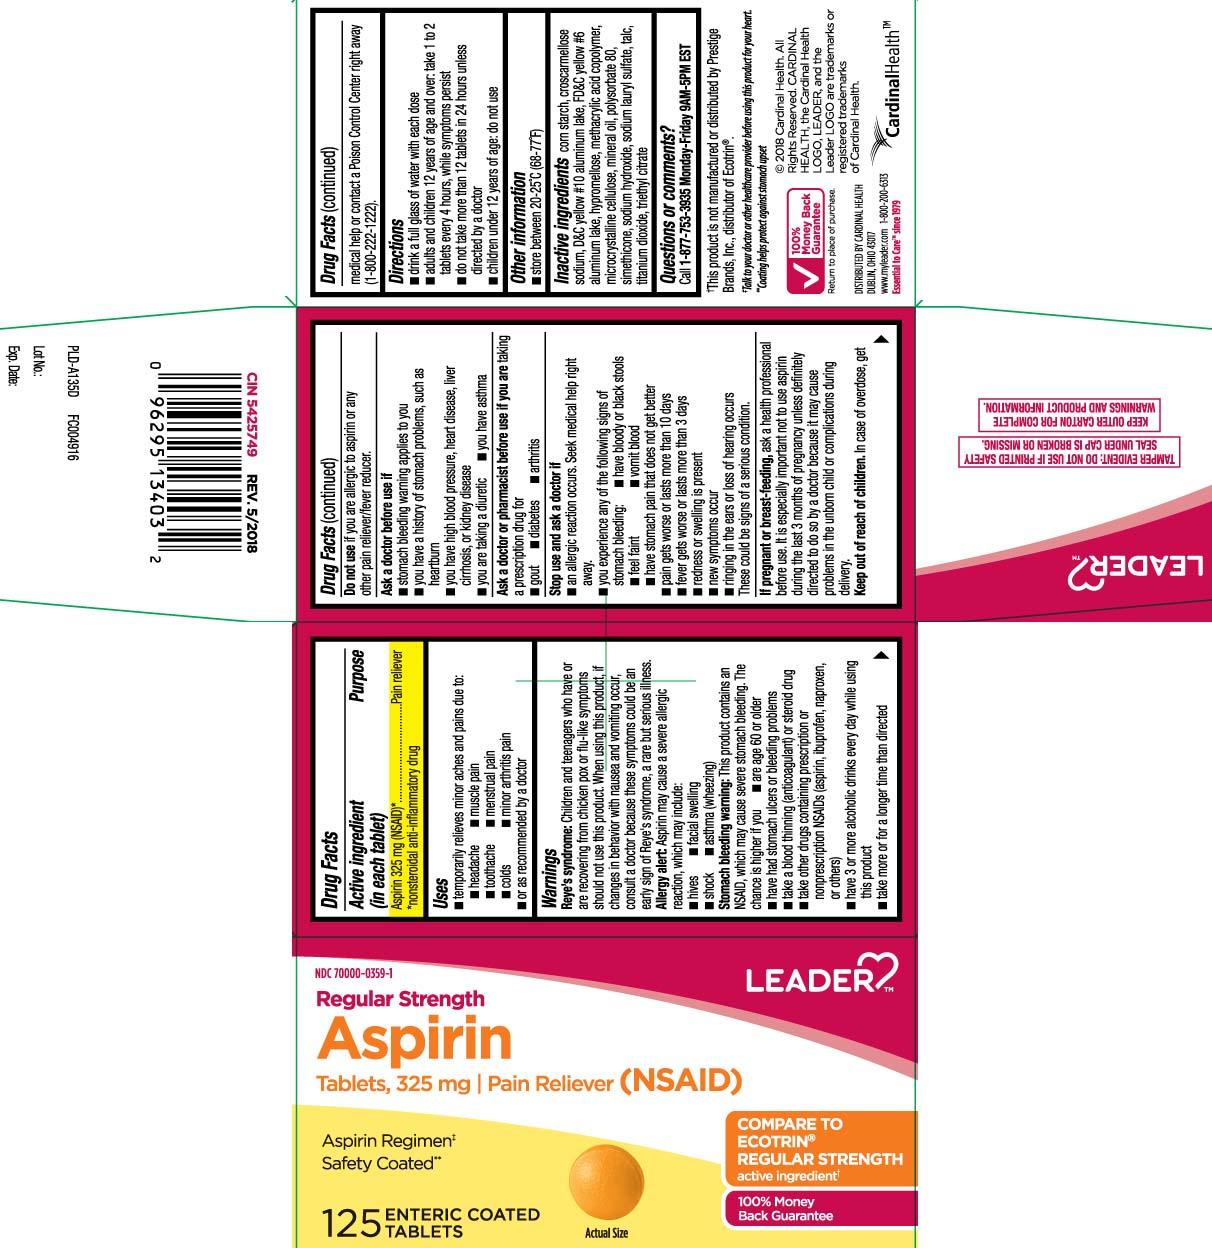 Aspirin - regular strength (Aspirin)